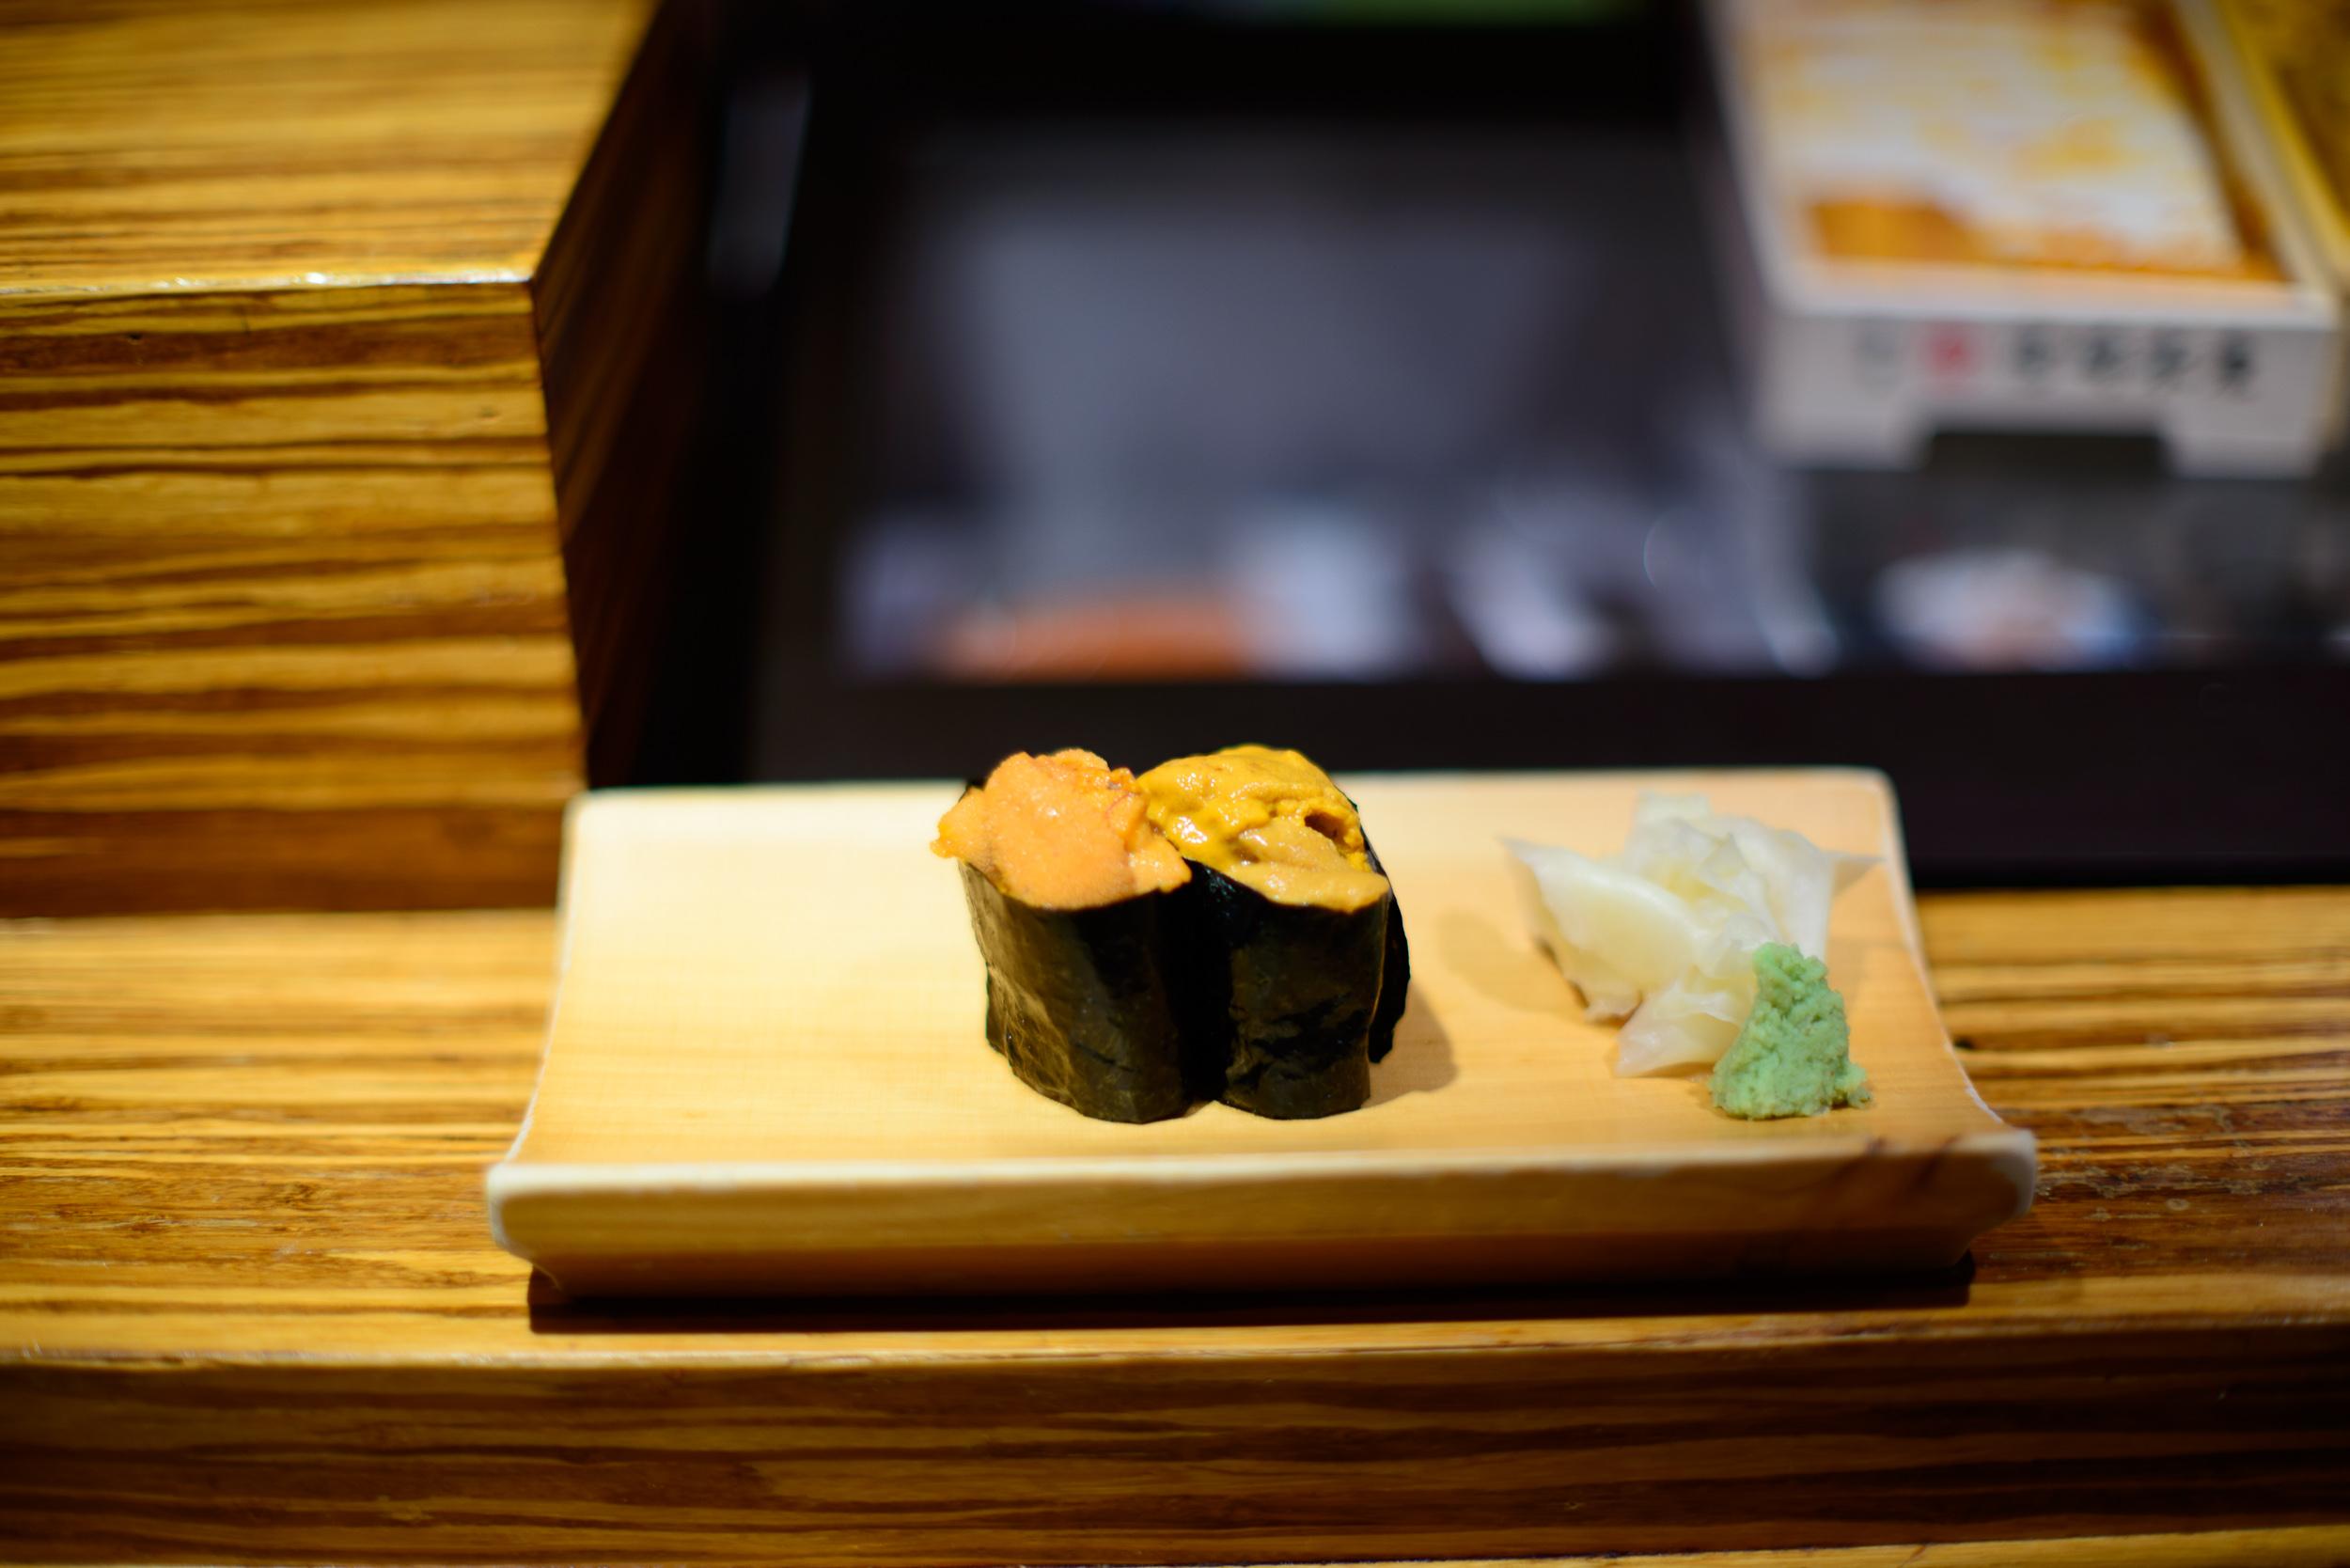 4th Course: Hokkaido and Santa Barbara sea urchin